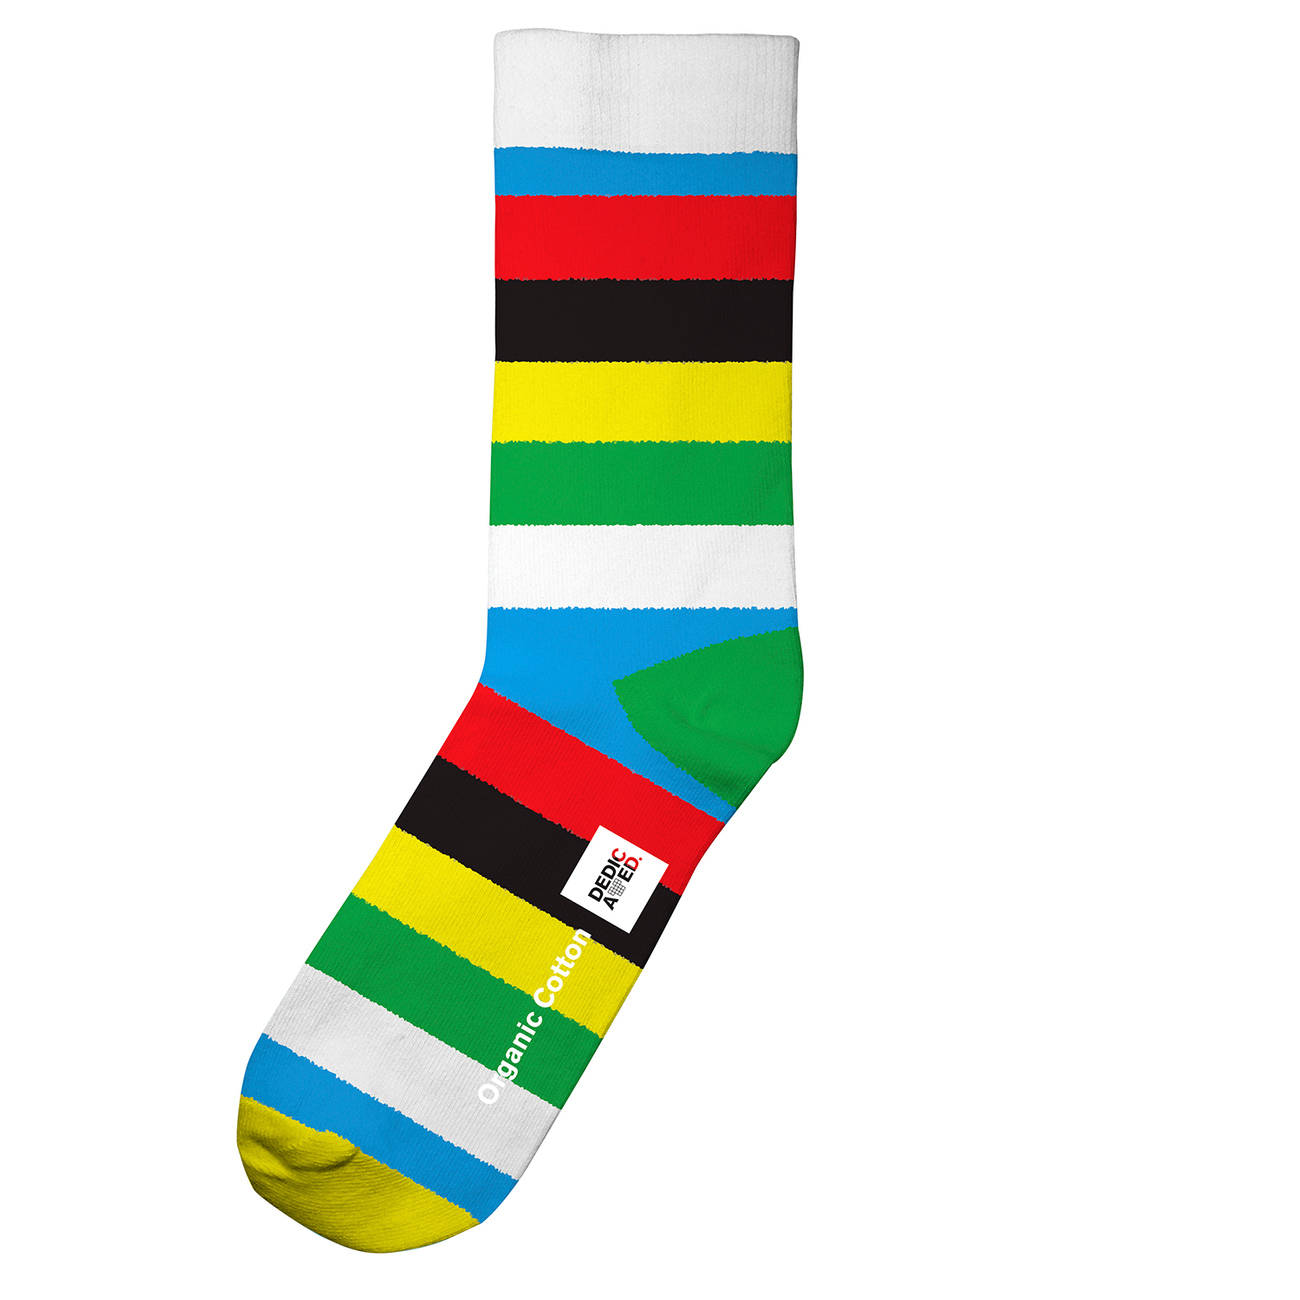 Socks Sigtuna World Champion